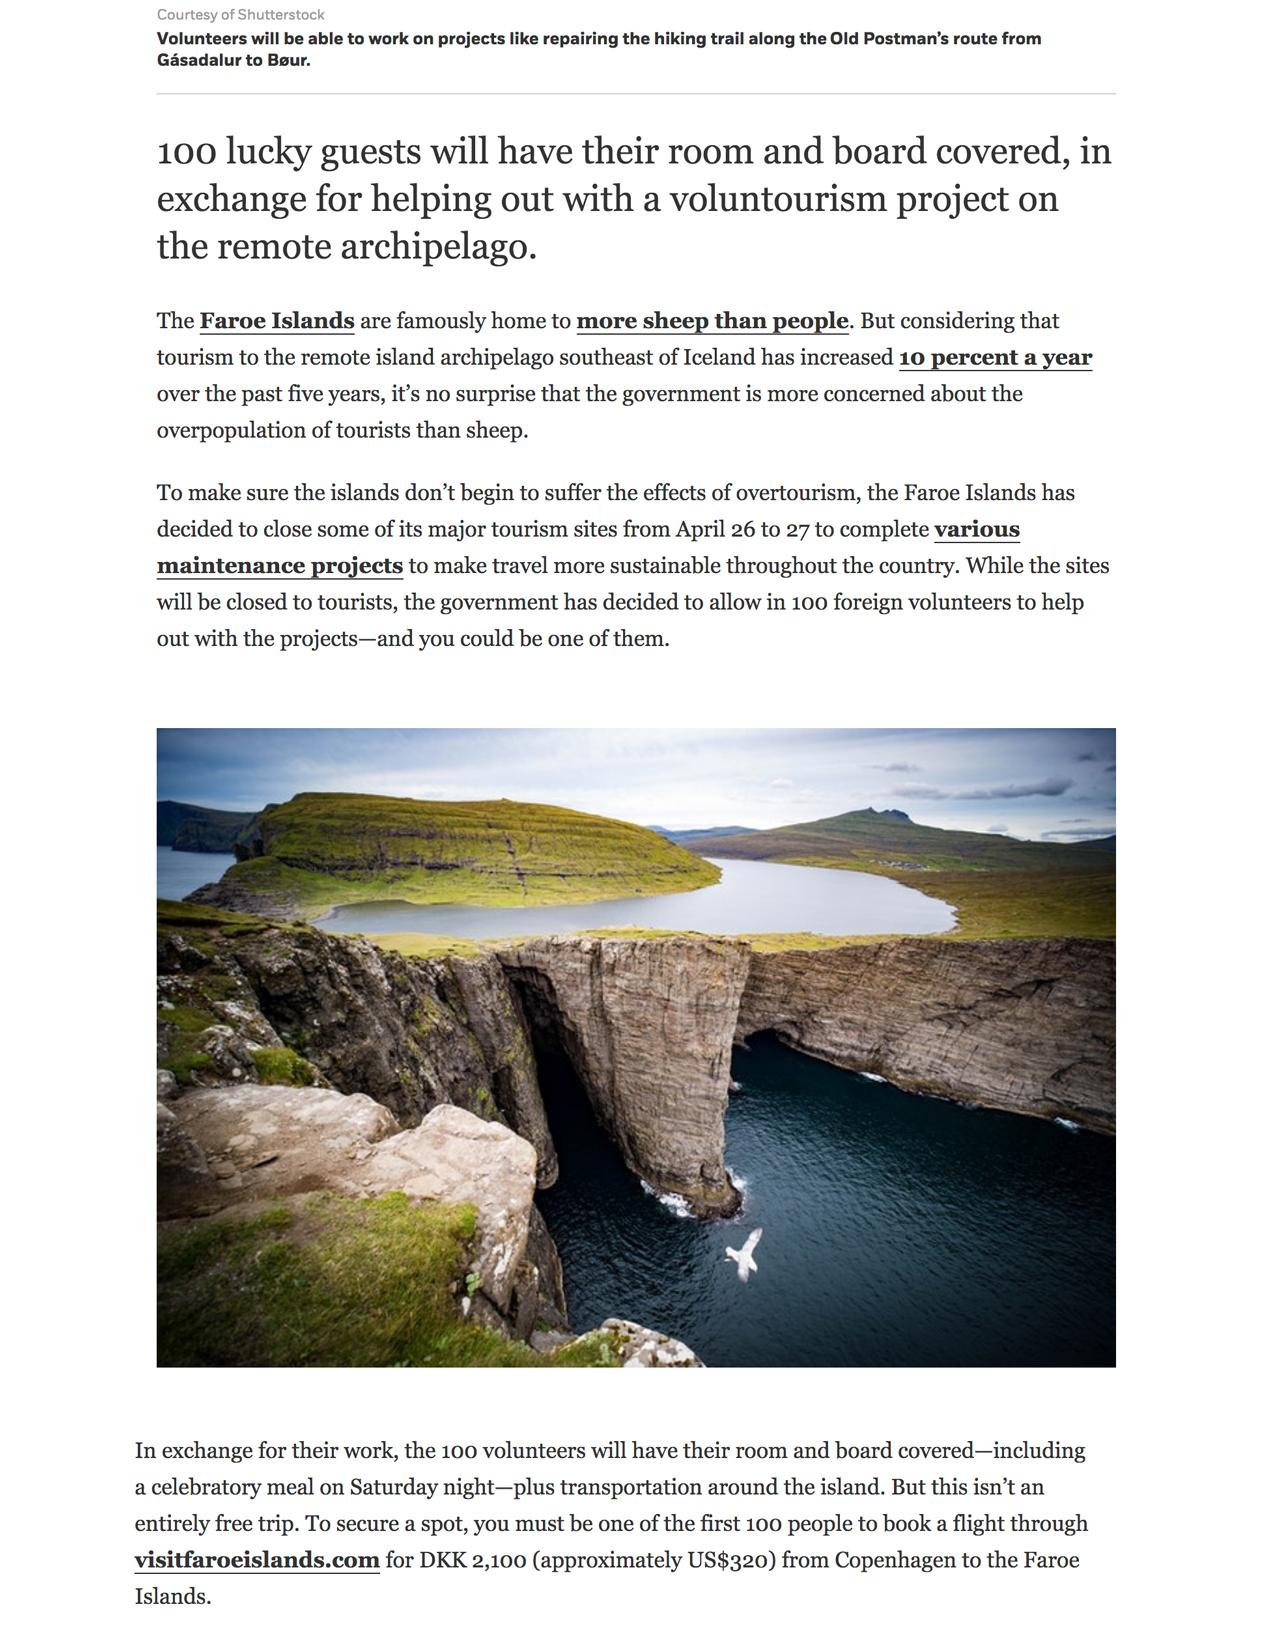 Faroe2.jpg